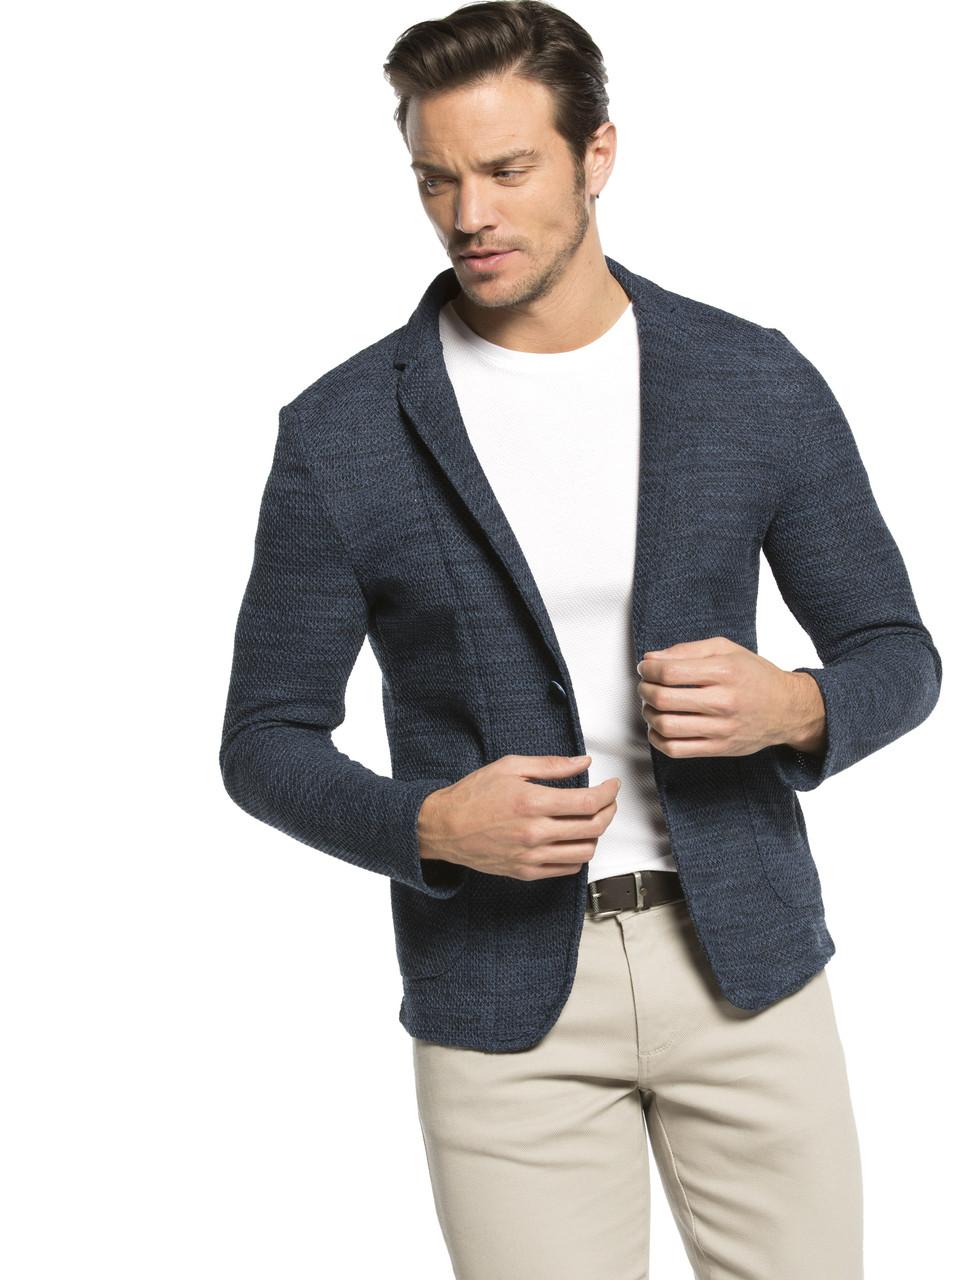 Серый мужской пиджак LC Waikiki / ЛС Вайкики с накладными карманами